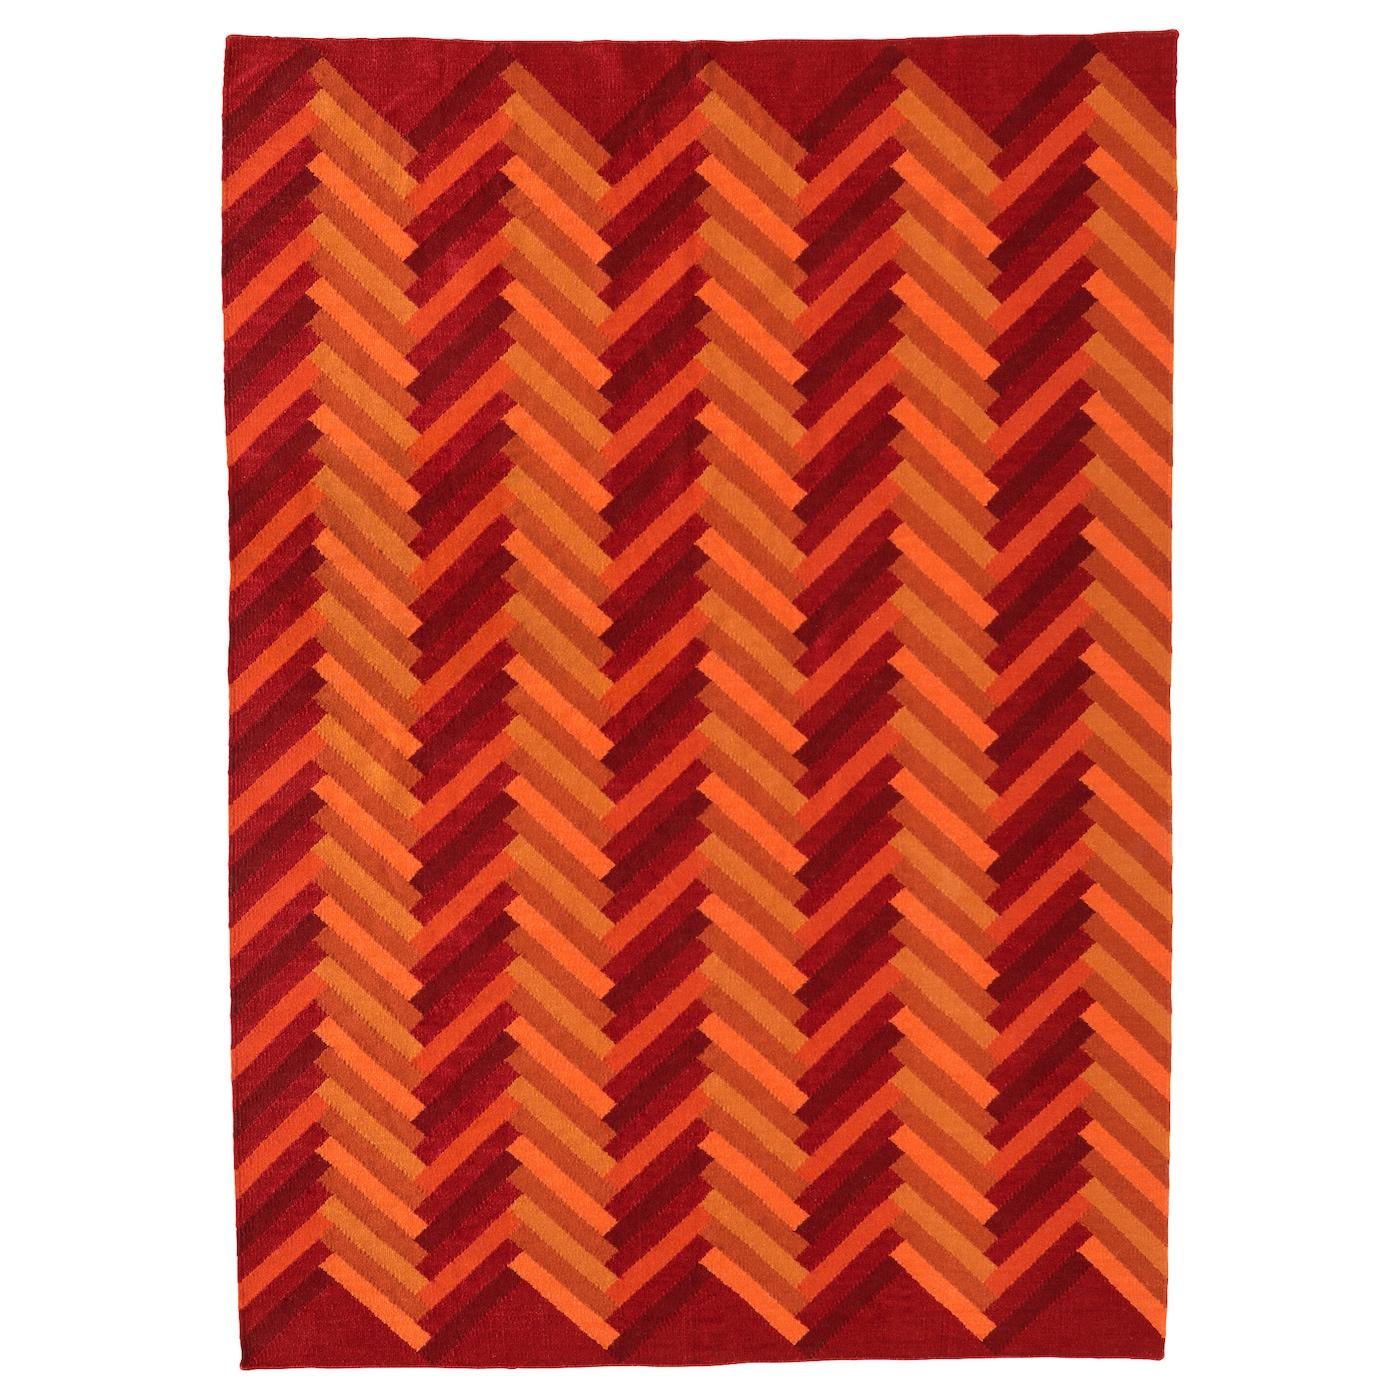 Stockholm 2017 Zigzag Pattern Handmade